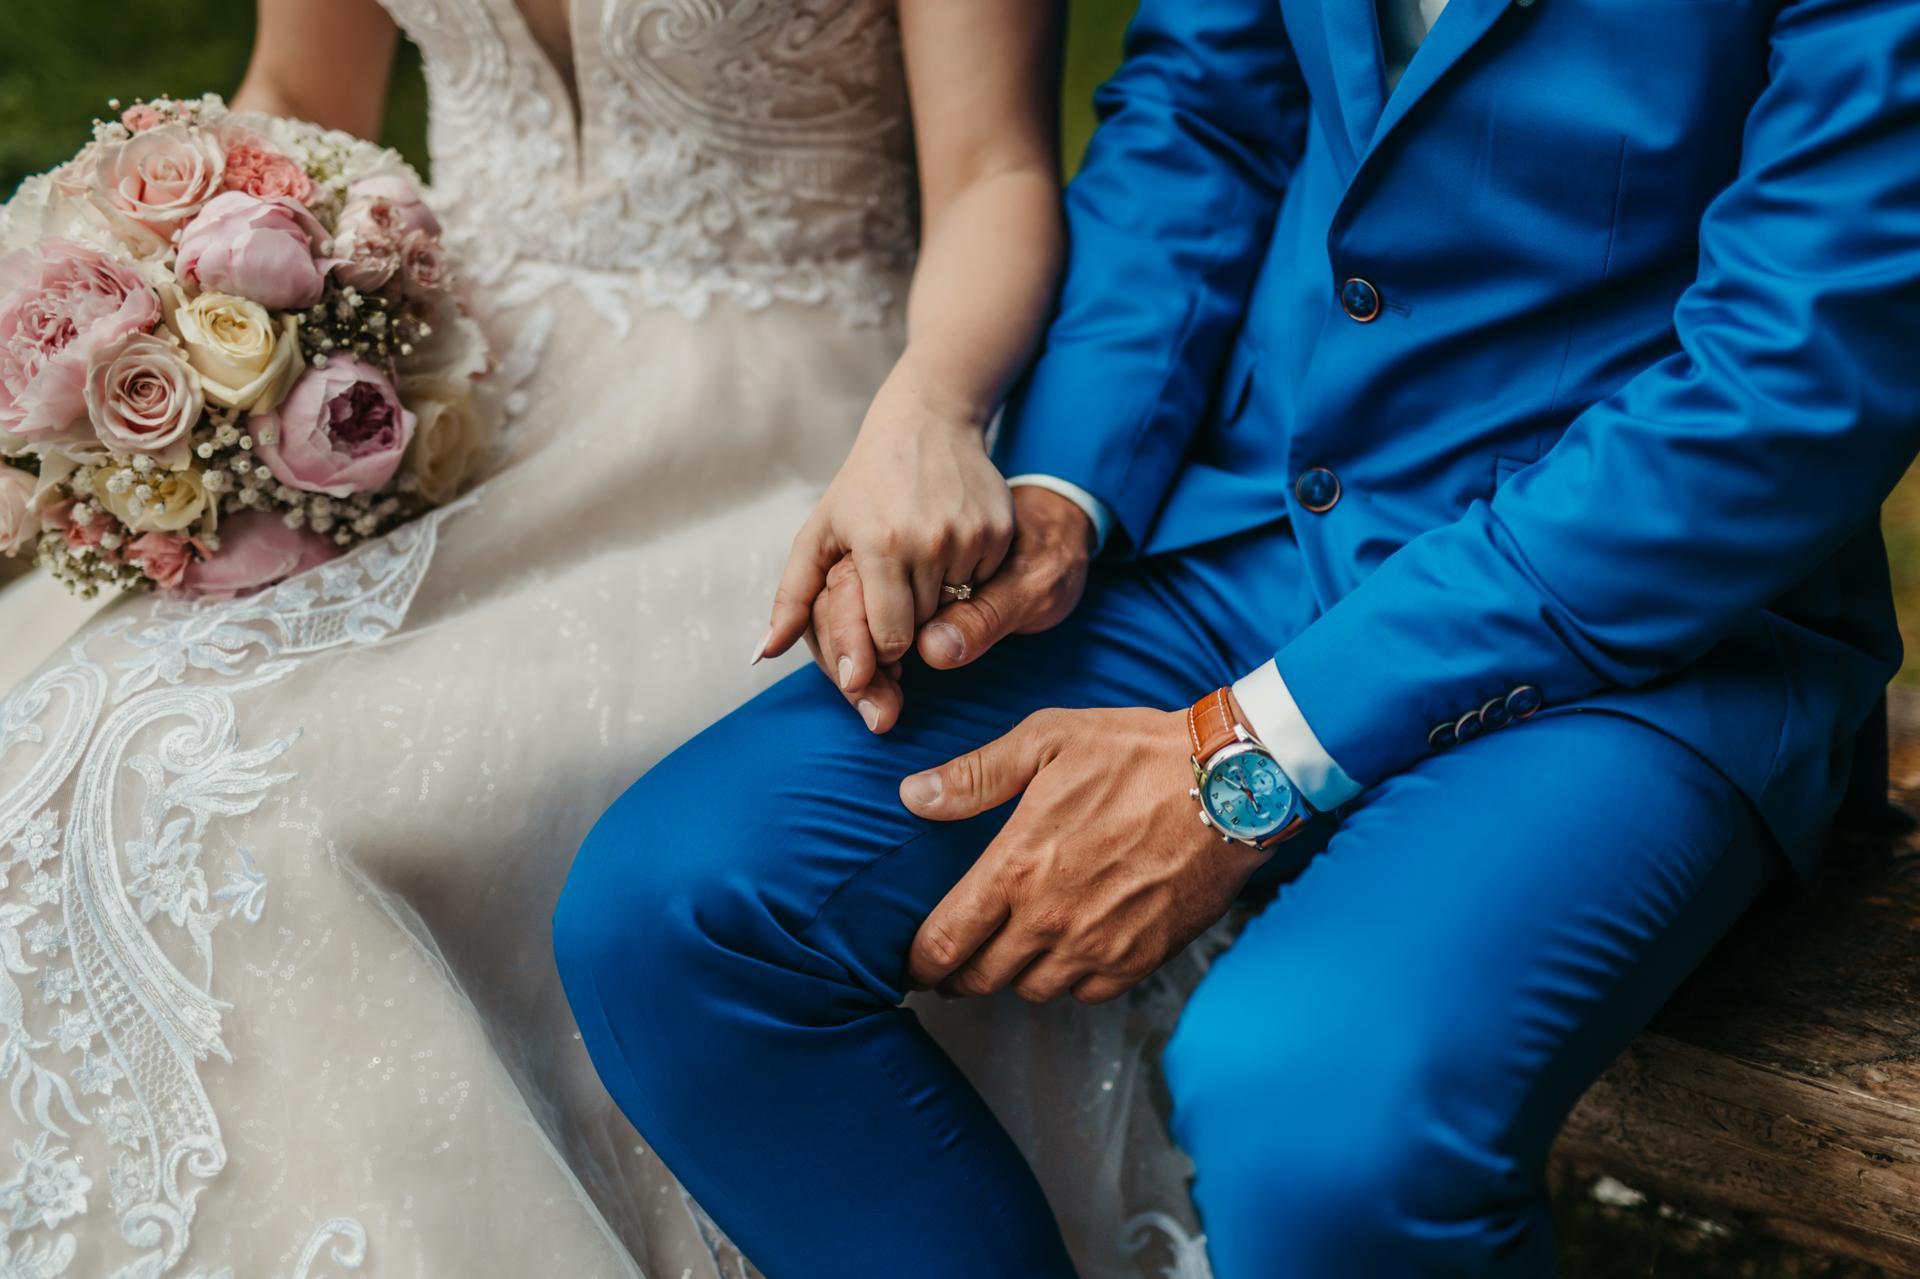 Our wedding ❤️ - Obrázok č. 7